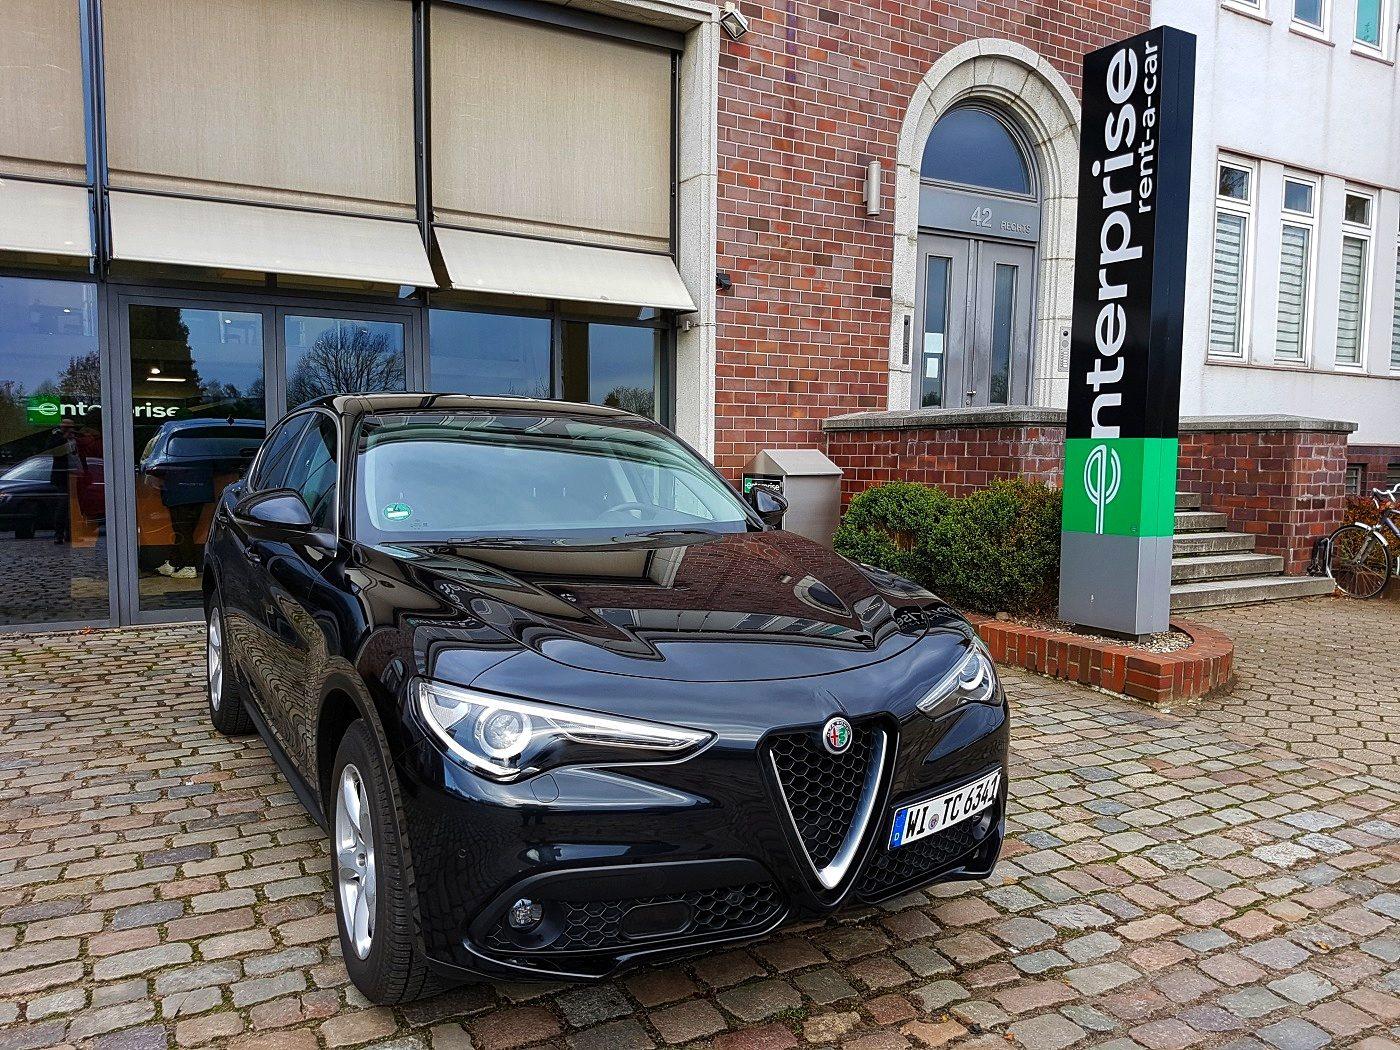 Enterprise Alfa Romeo Stelvio Enterprise-01